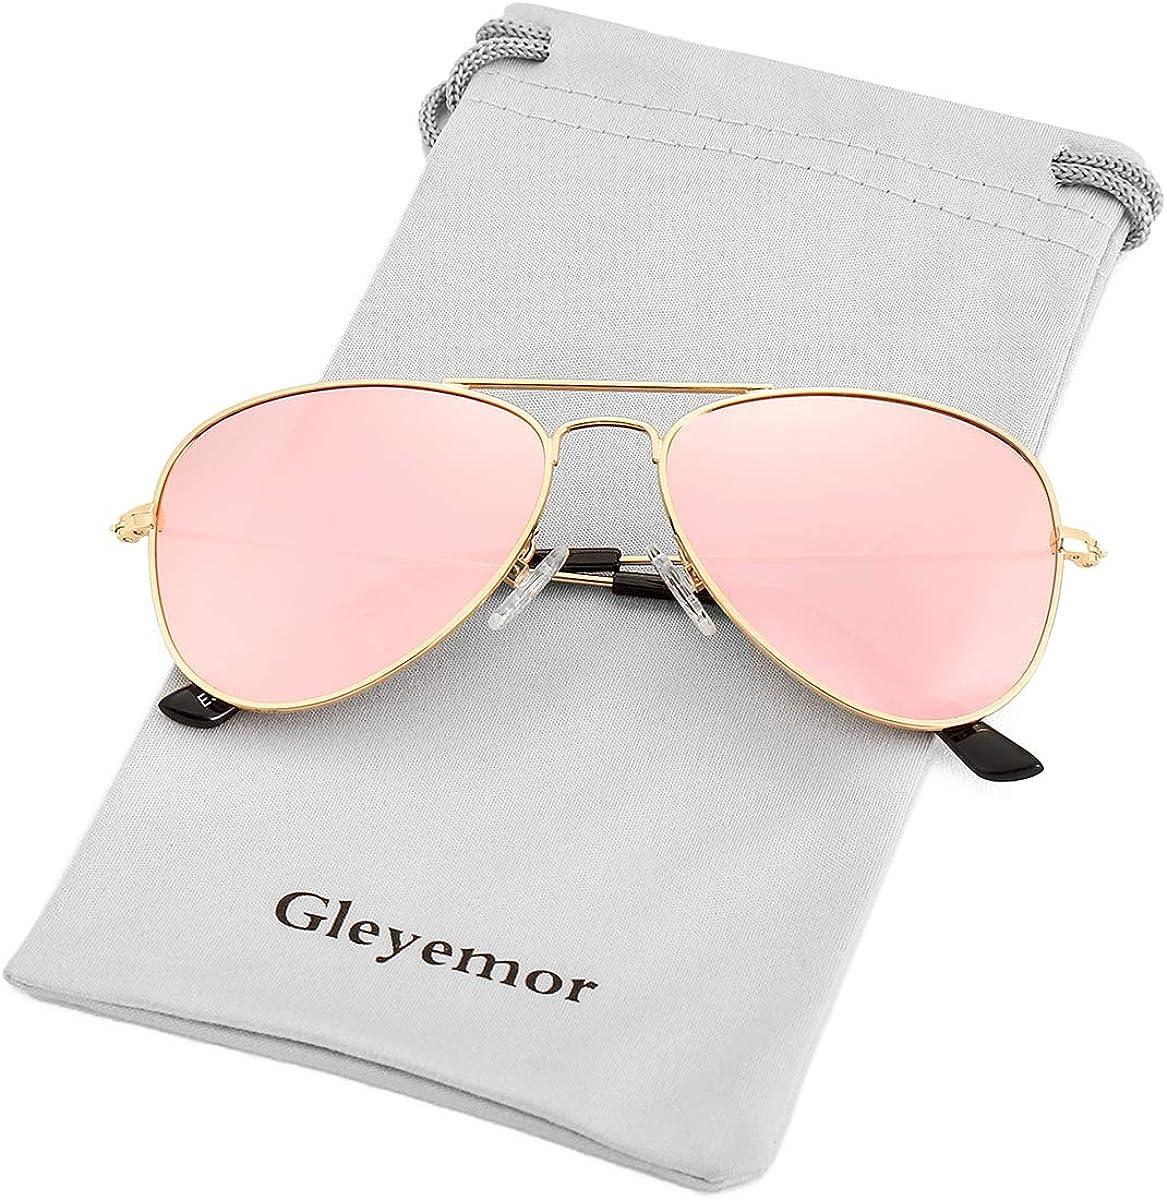 Kids Polarized Aviator Sunglasses for Little Girls Boys Juniors Teenagers,...